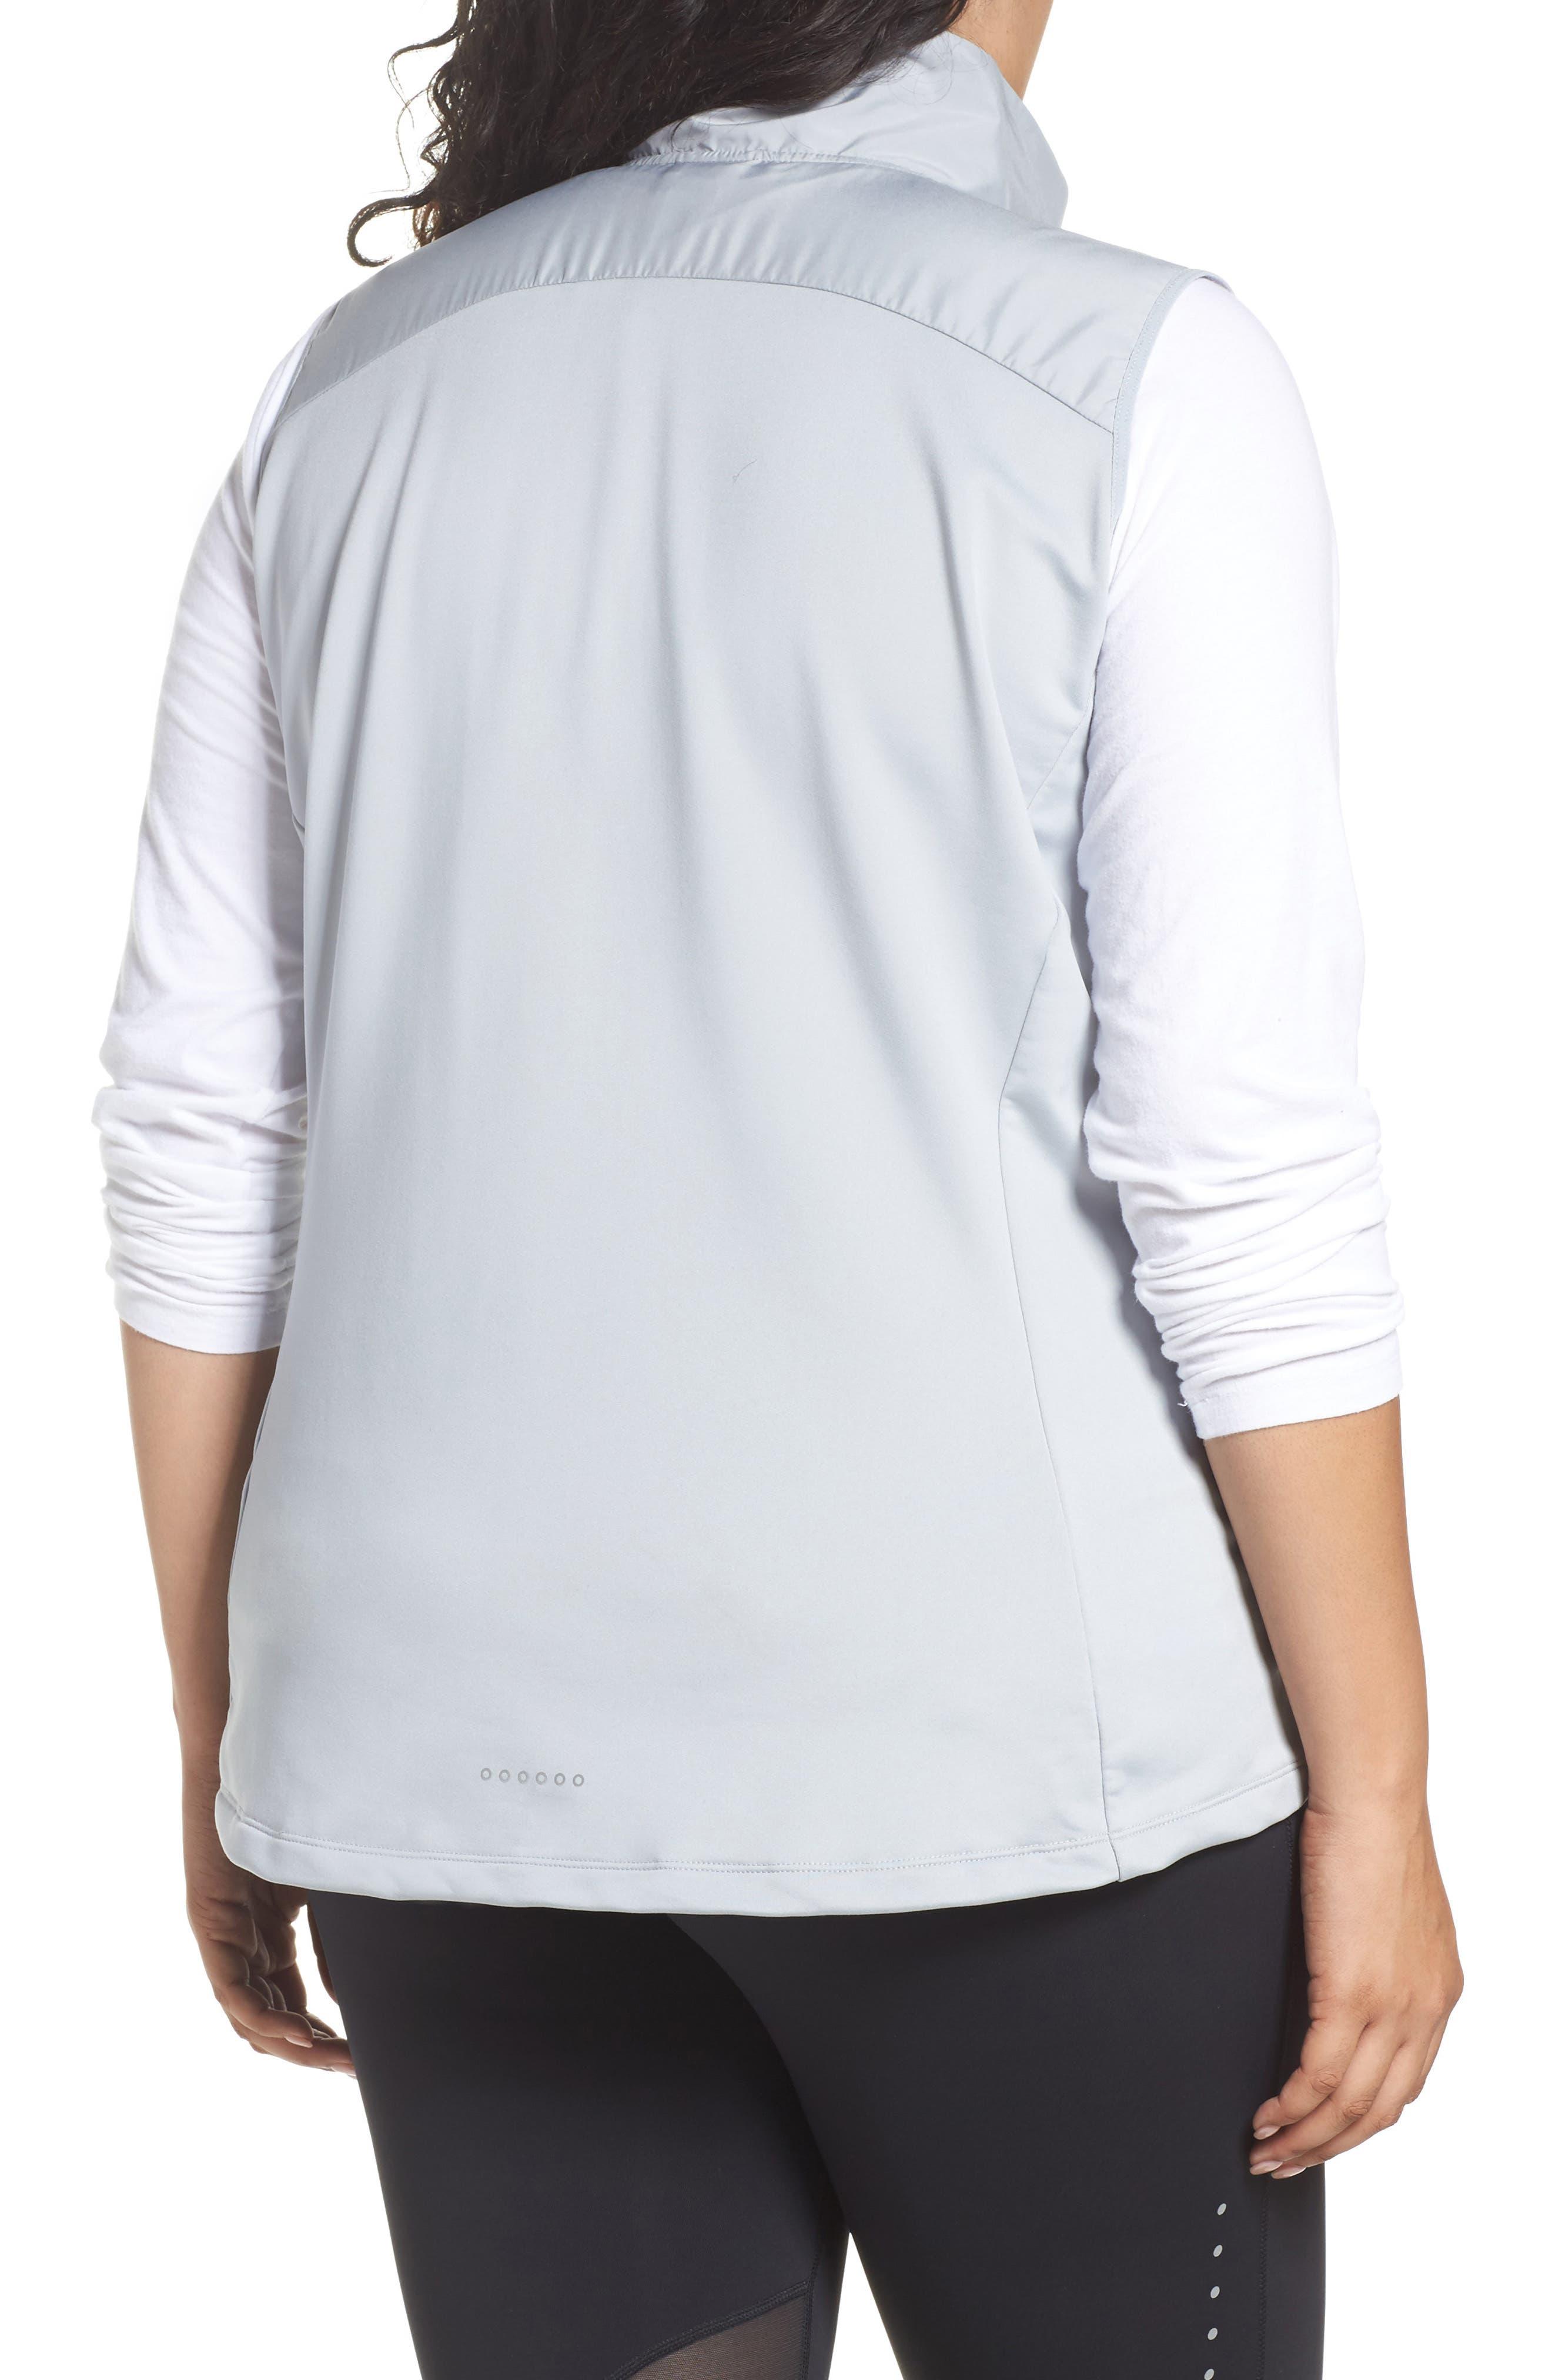 Essentials Running Vest,                             Alternate thumbnail 2, color,                             Wolf Grey/ Metallic Silver